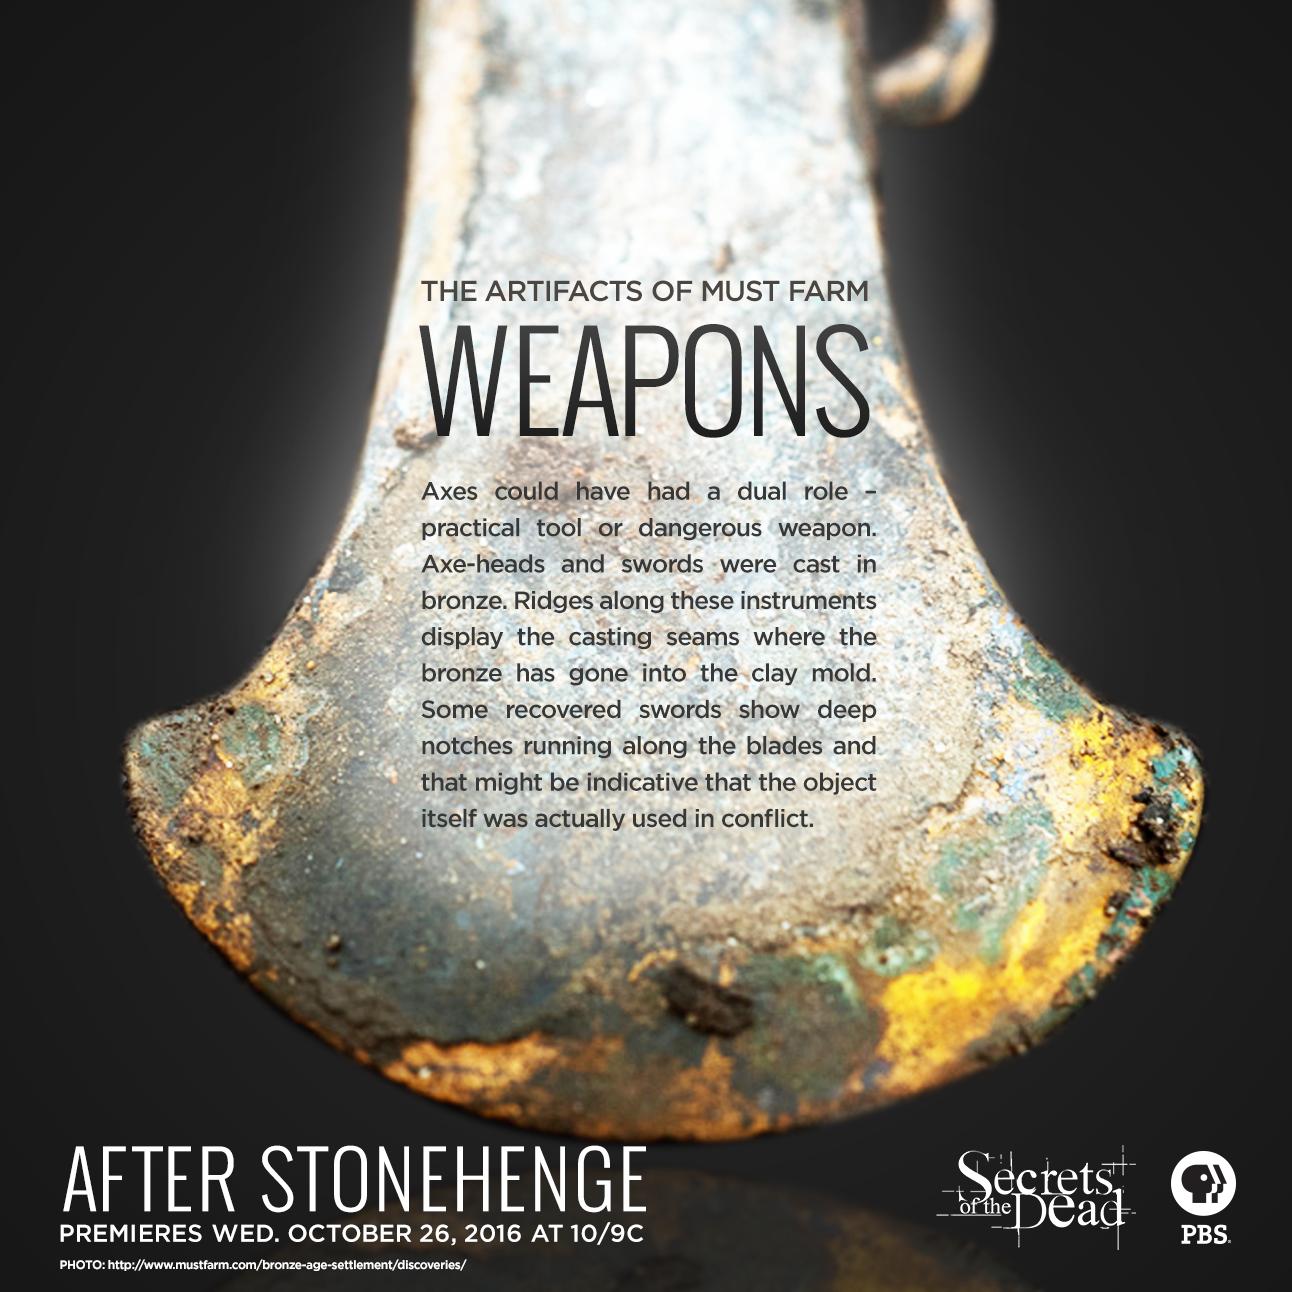 Secrets-AfterStonehenge-Weapons